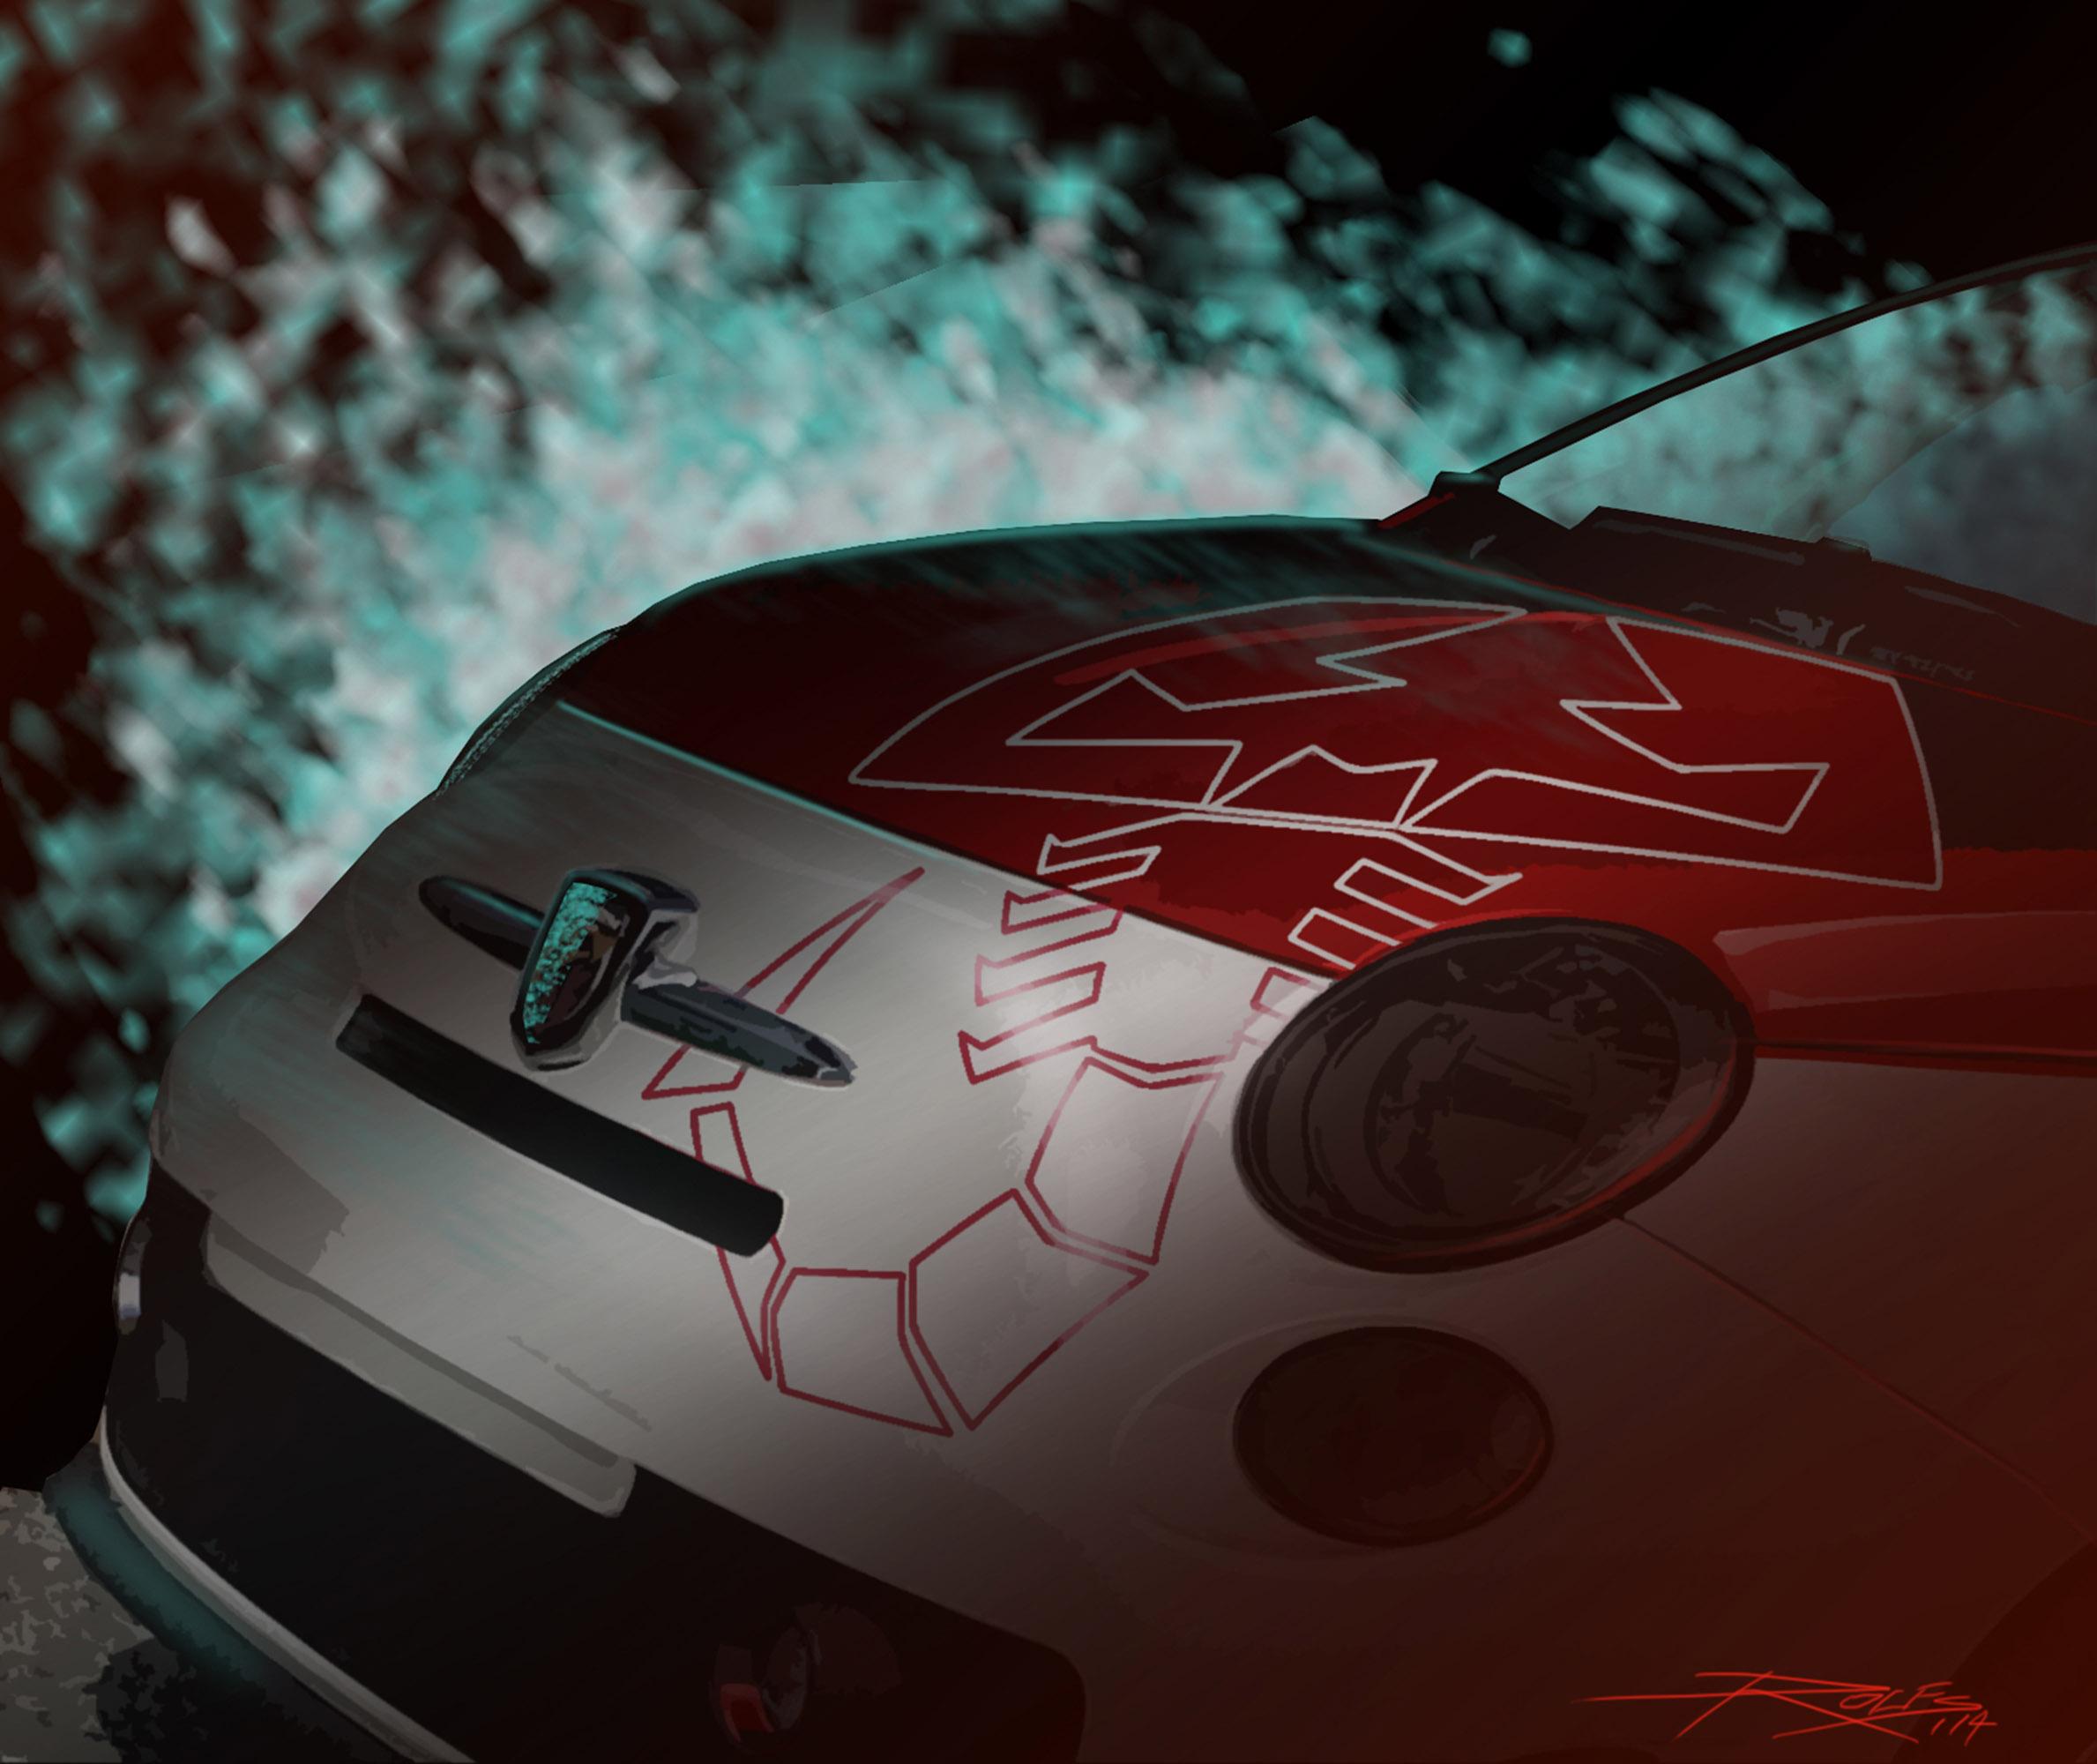 2018 Maserati Levante Shtorm by LARTE Design 4K Wallpaper